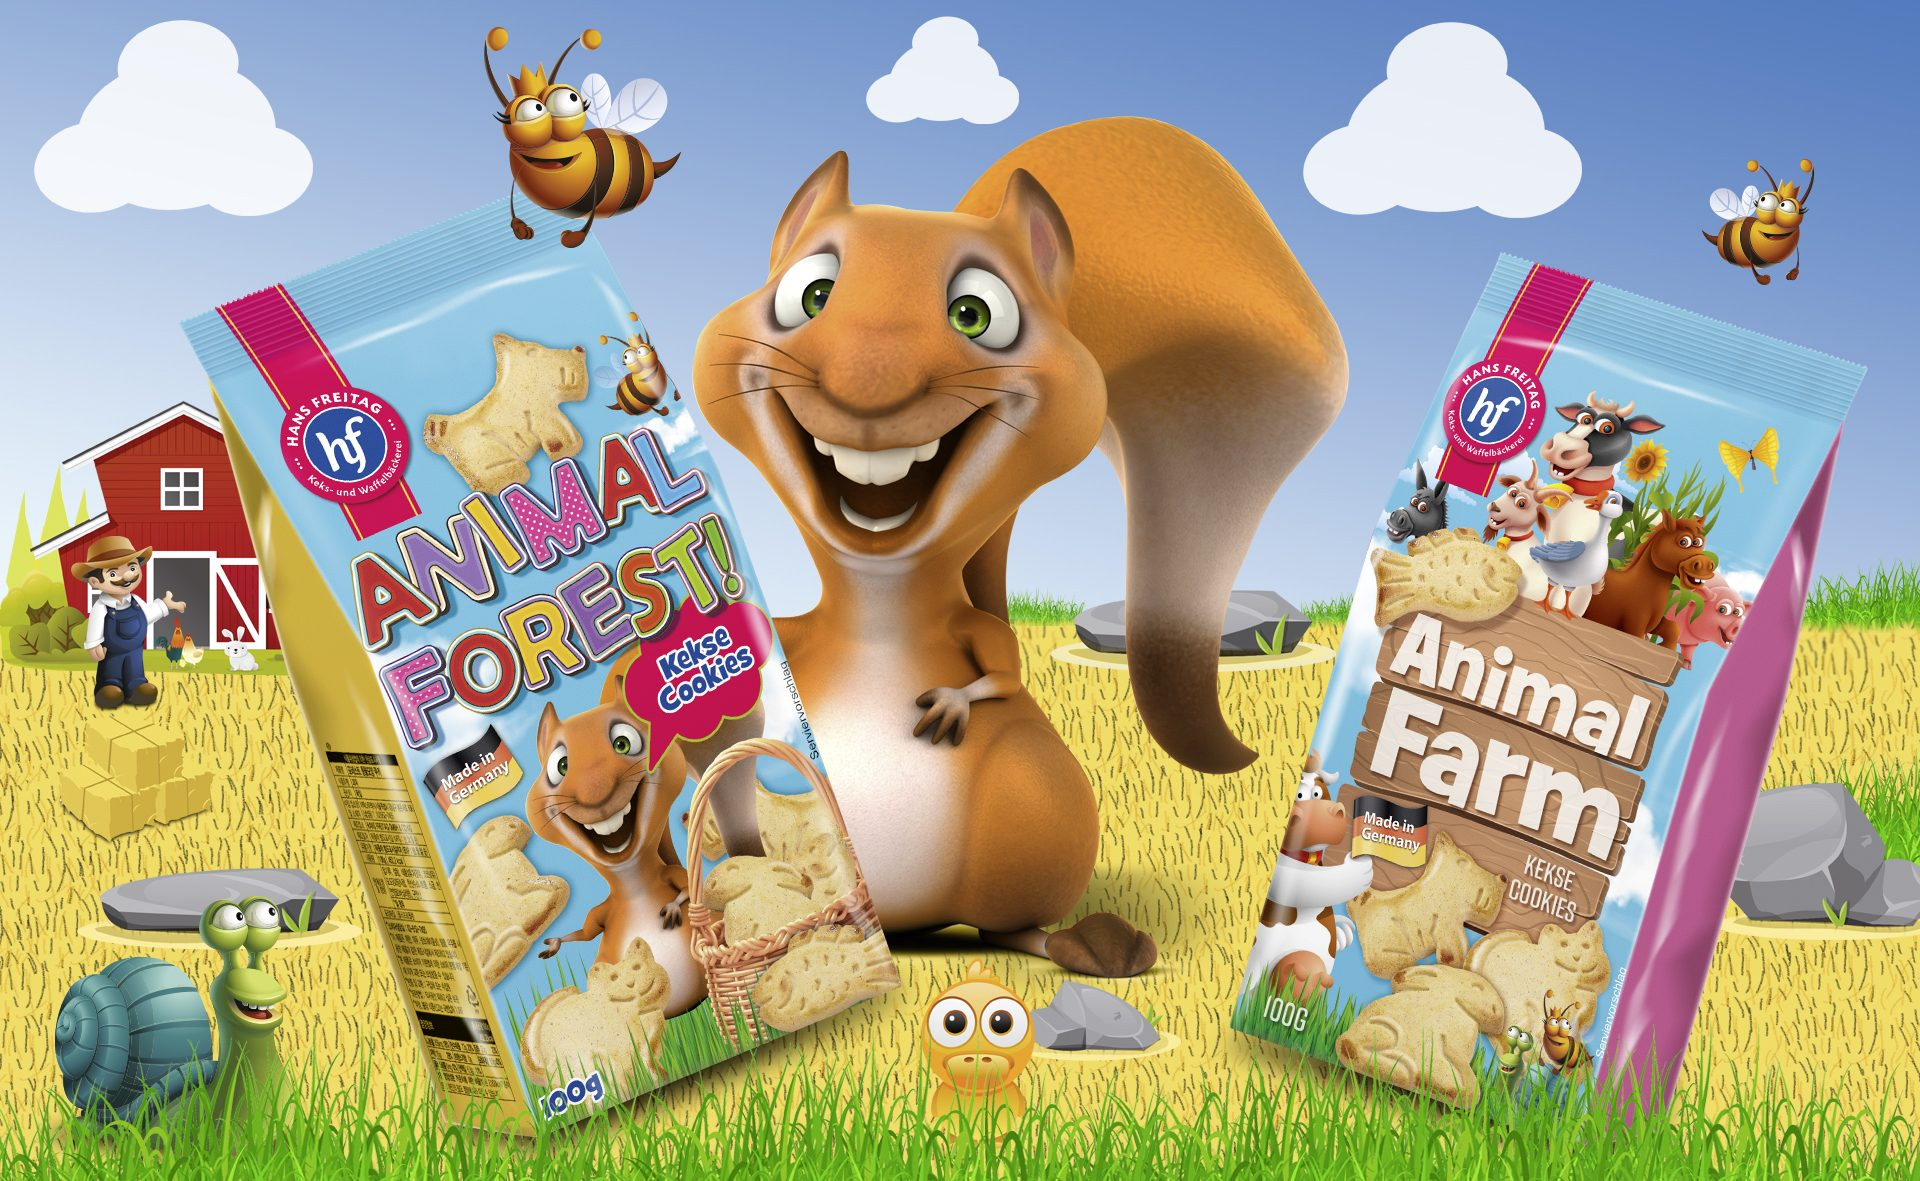 Verpackungsdesign Malvega - Referenz: Animal Farm von Hans Freitag